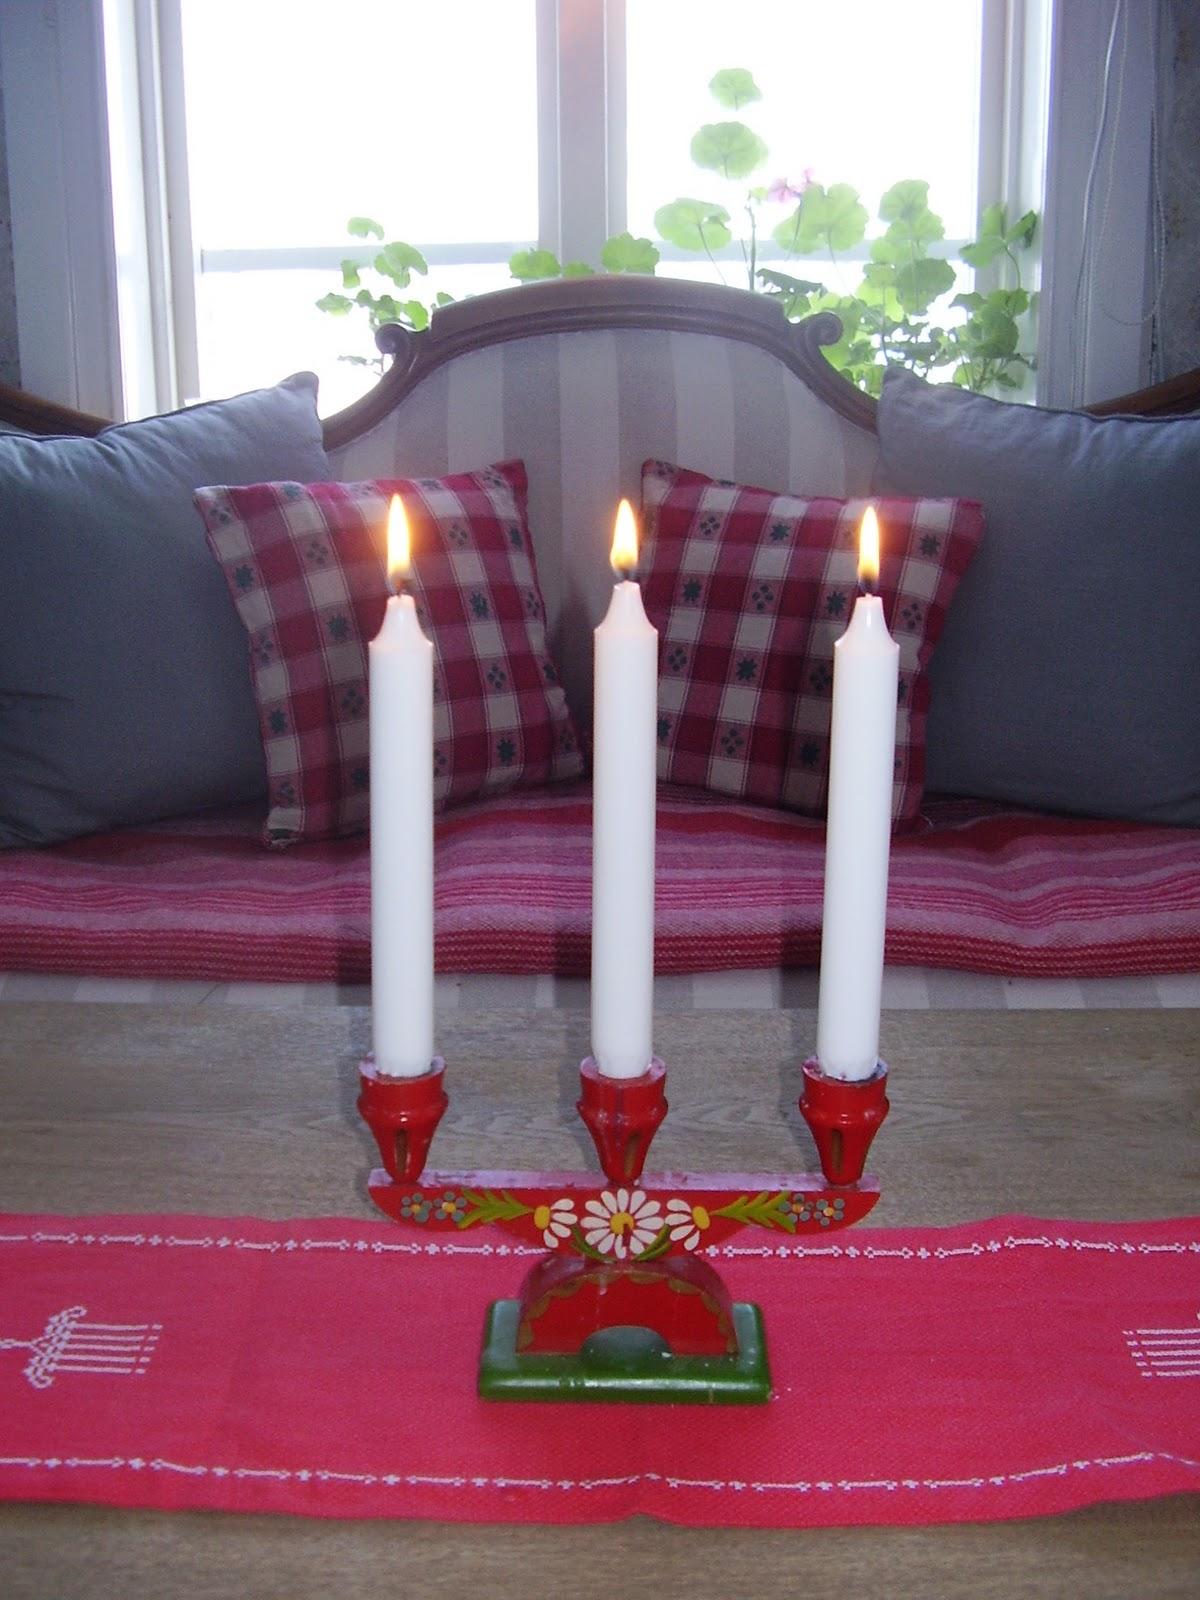 Elins stuga: jul i stugan